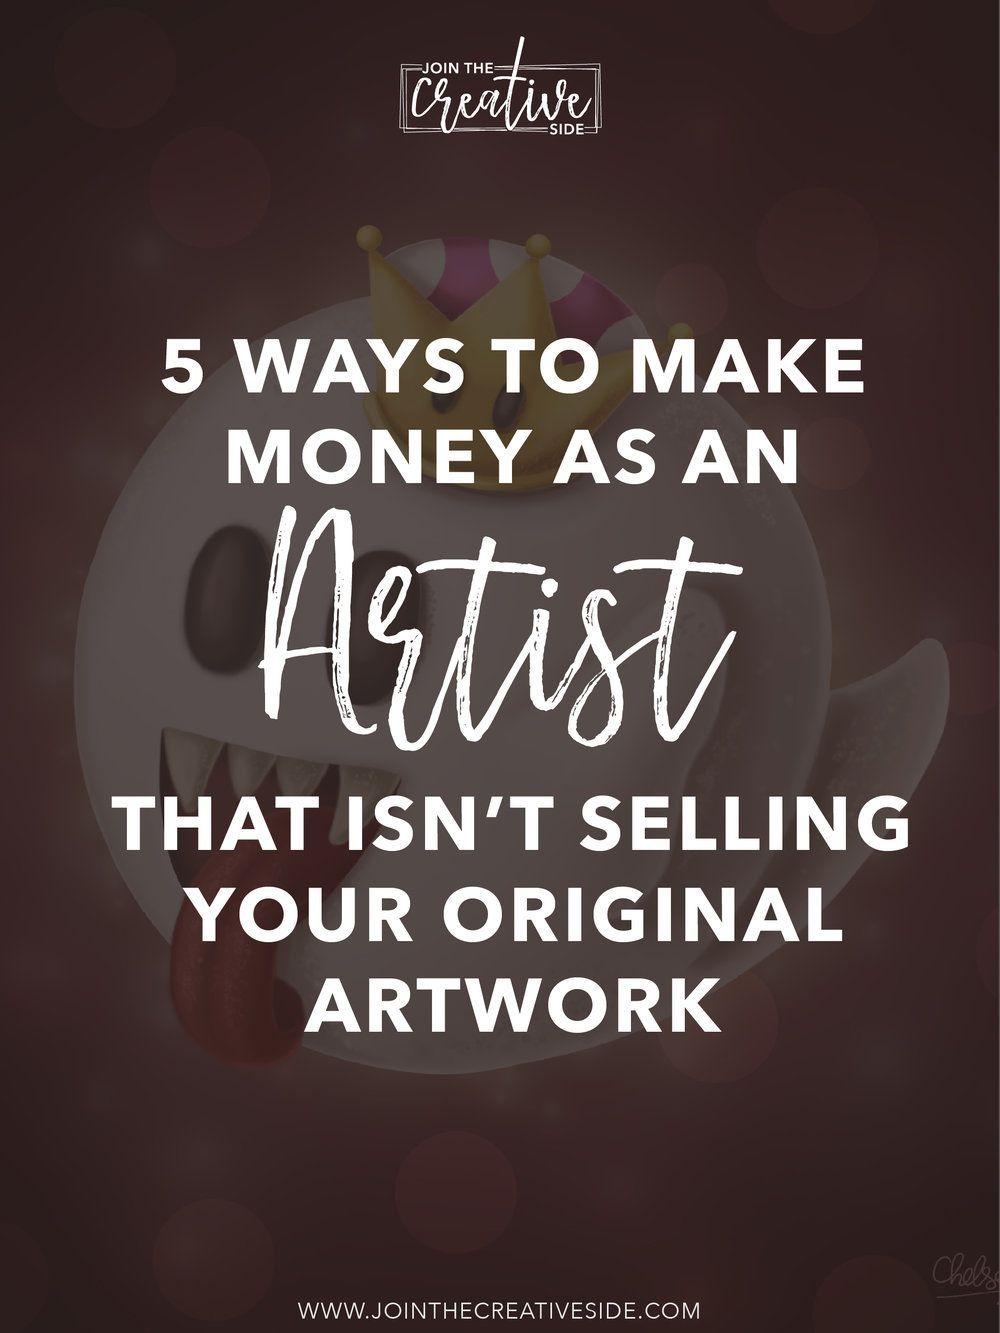 5 ways you can make money as an artist that isn't selling your original artwork — Join The Creative Side - 5 ways you can make money as an artist that isn't selling your original artwork — Join The Creat - #3dArtwork #3dCharacter #AnimalIllustrations #ArtOfAnimation #artist #Artwork #CharacterIllustration #ConceptArt #Creative #DigitalArt #DigitalPaintings #Fantasy #FantasyArt #FantasyArtwork #IllustrationArt #InspiringArt #Isnt #join #LuisRoyo #MangaArt #MangaIllustration #Money #original #Pho